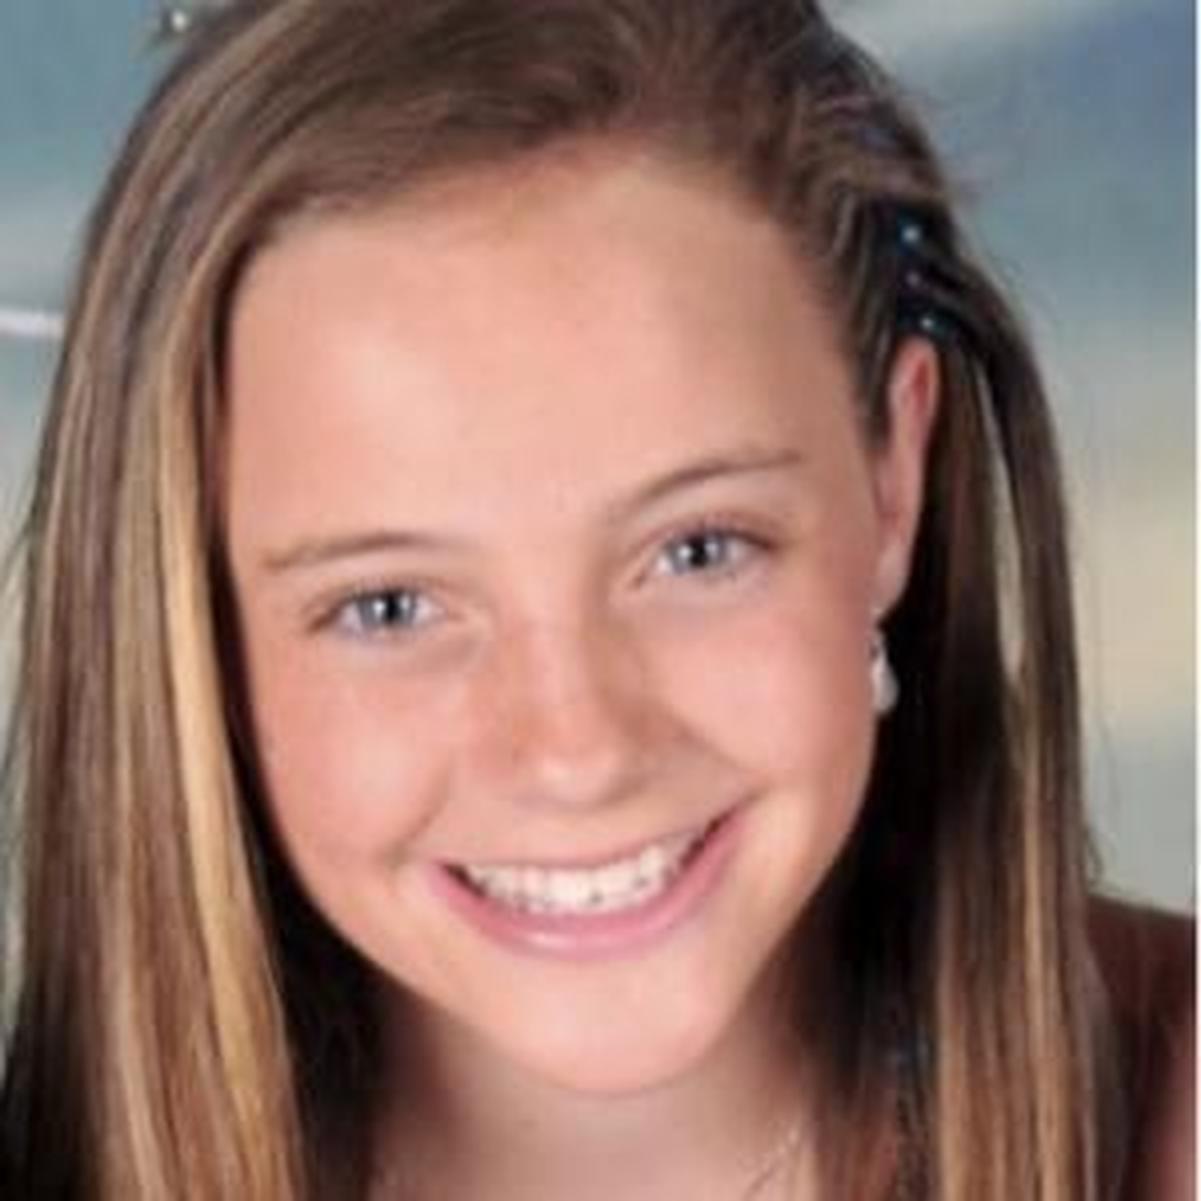 Chloe Channell